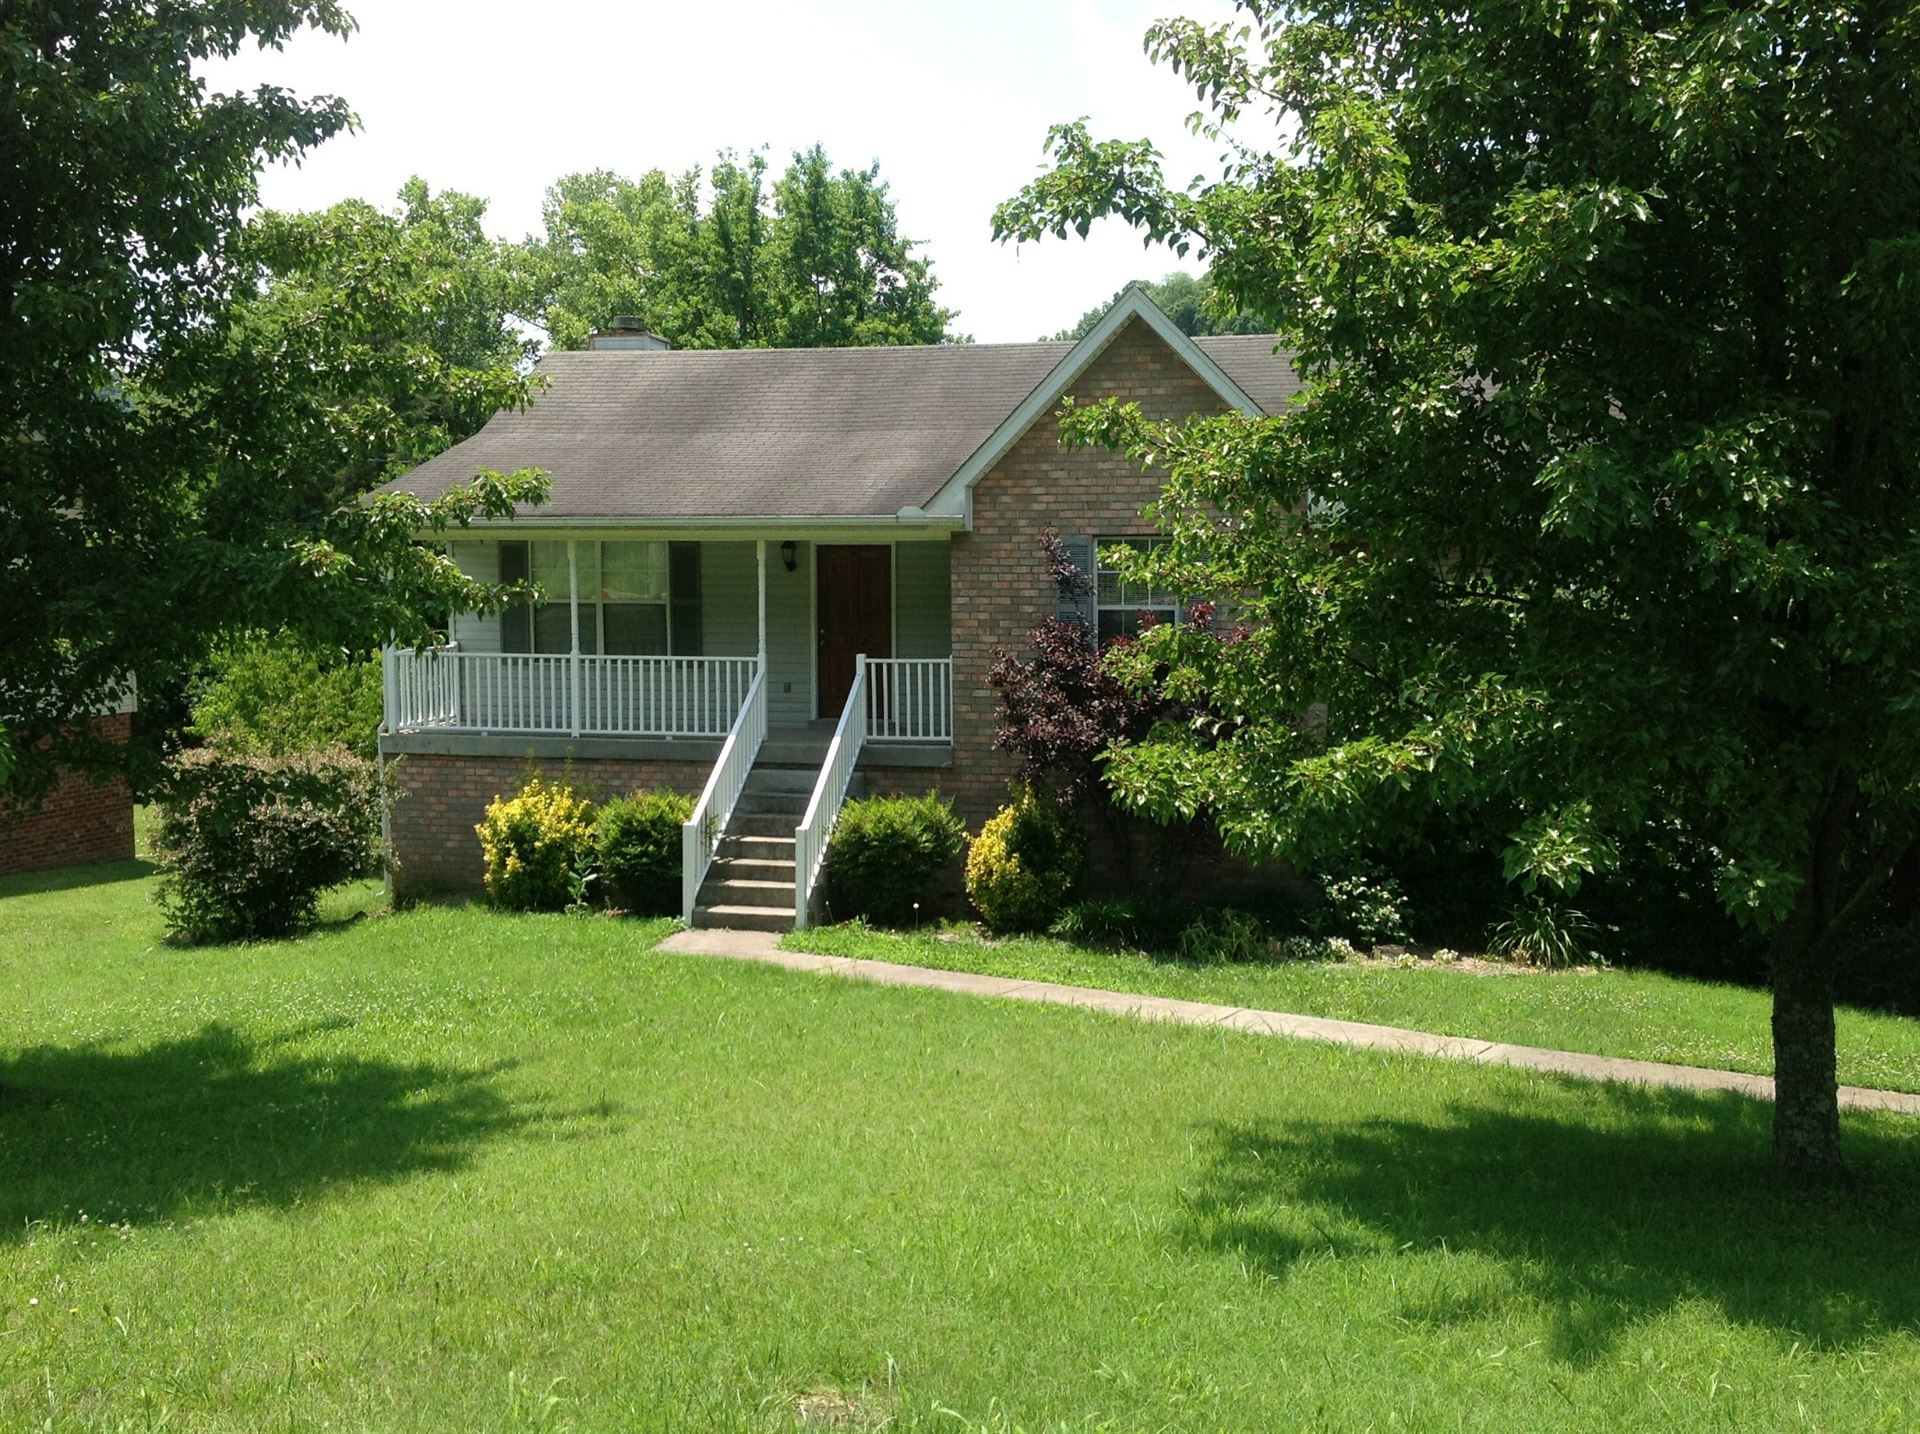 4572 Whites Creek Pike, Whites Creek, TN 37189 - MLS#: 2172236